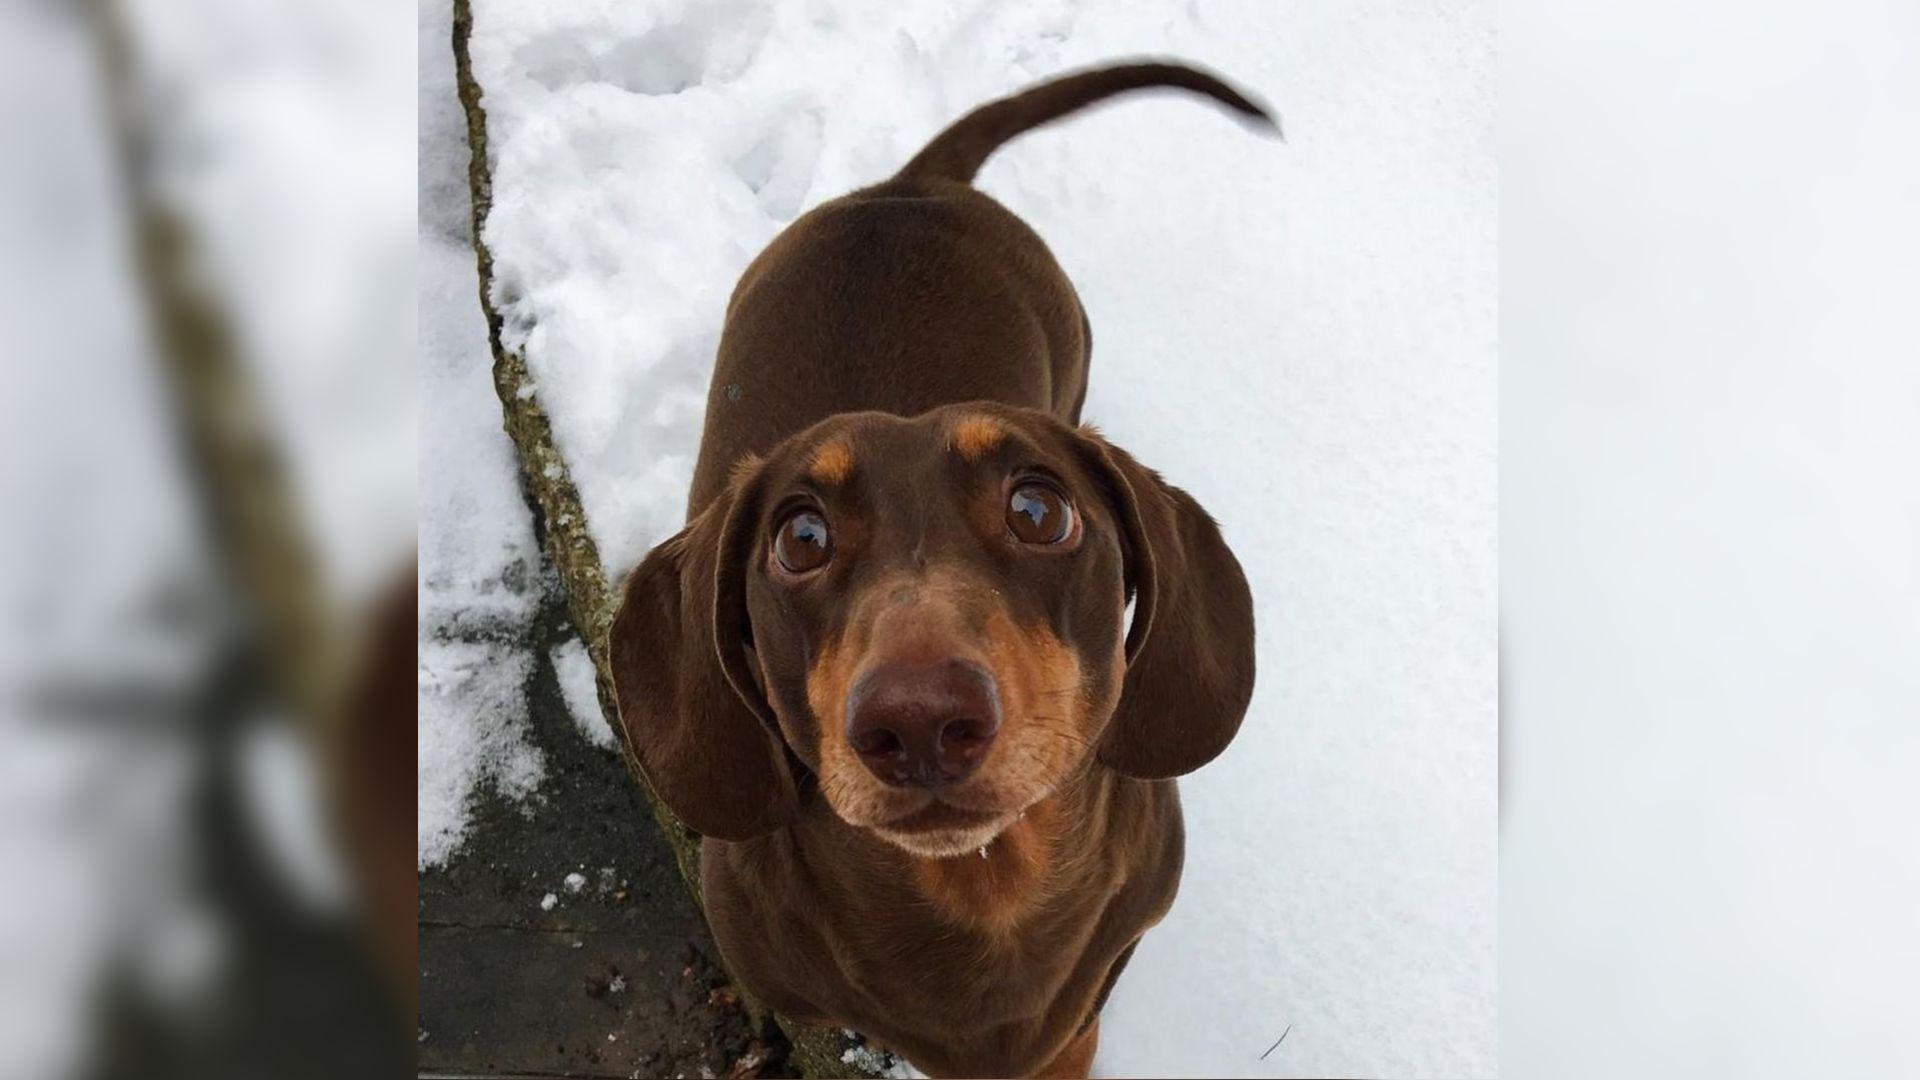 Szuka tacskó kutyáink verekszenek - Kutyák - richihir.hu